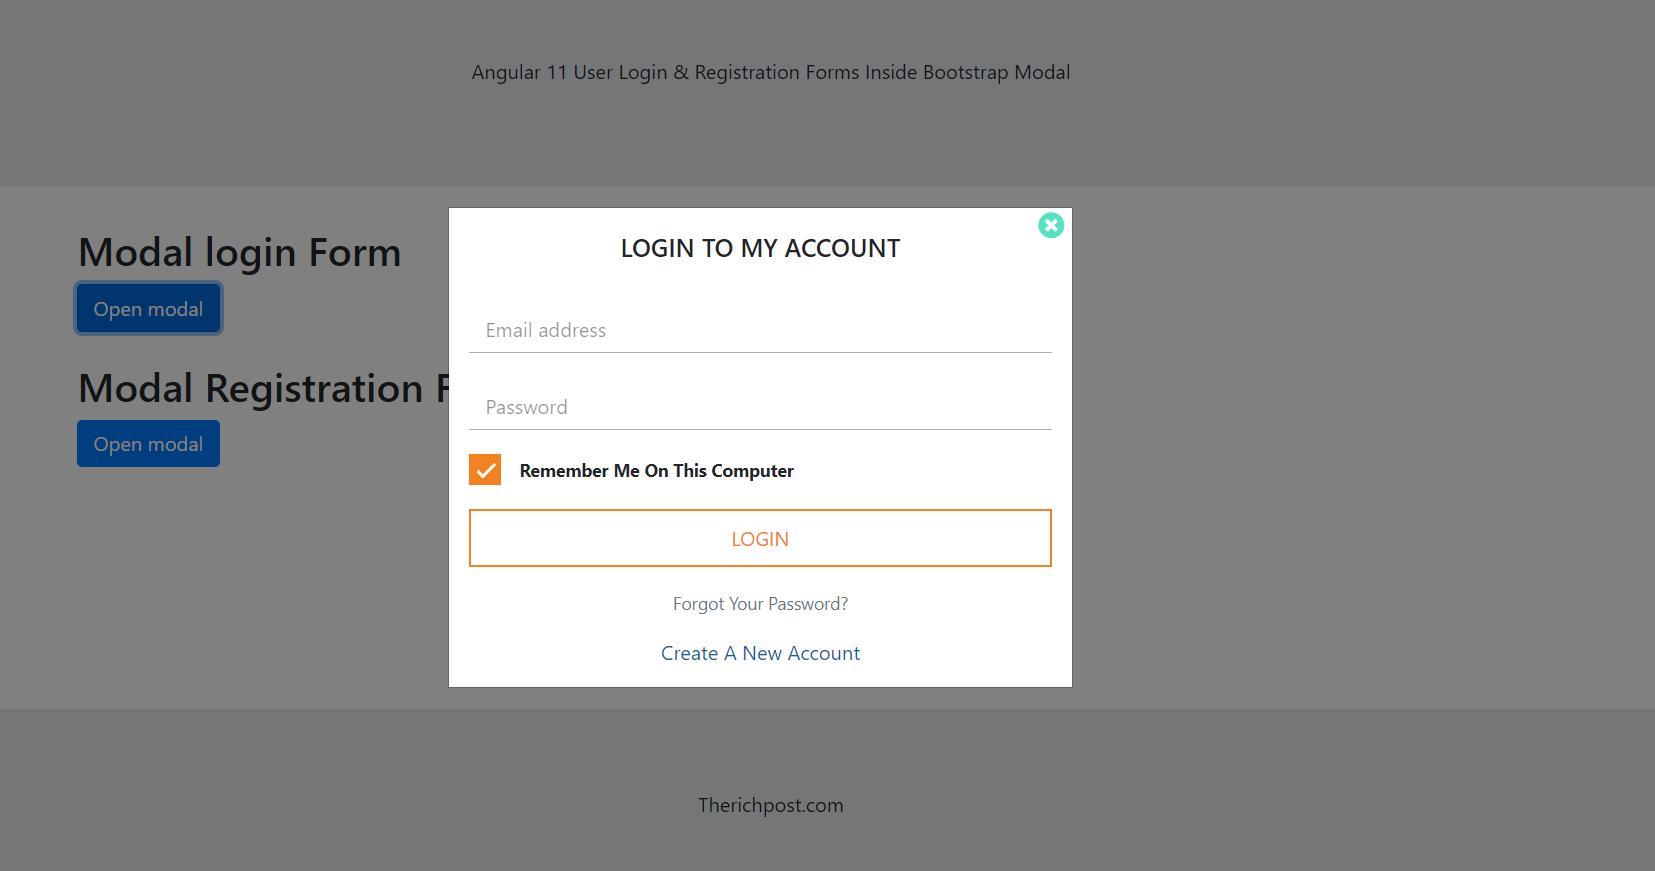 Angular 11 Login & Registration Forms inside Bootstrap Modal